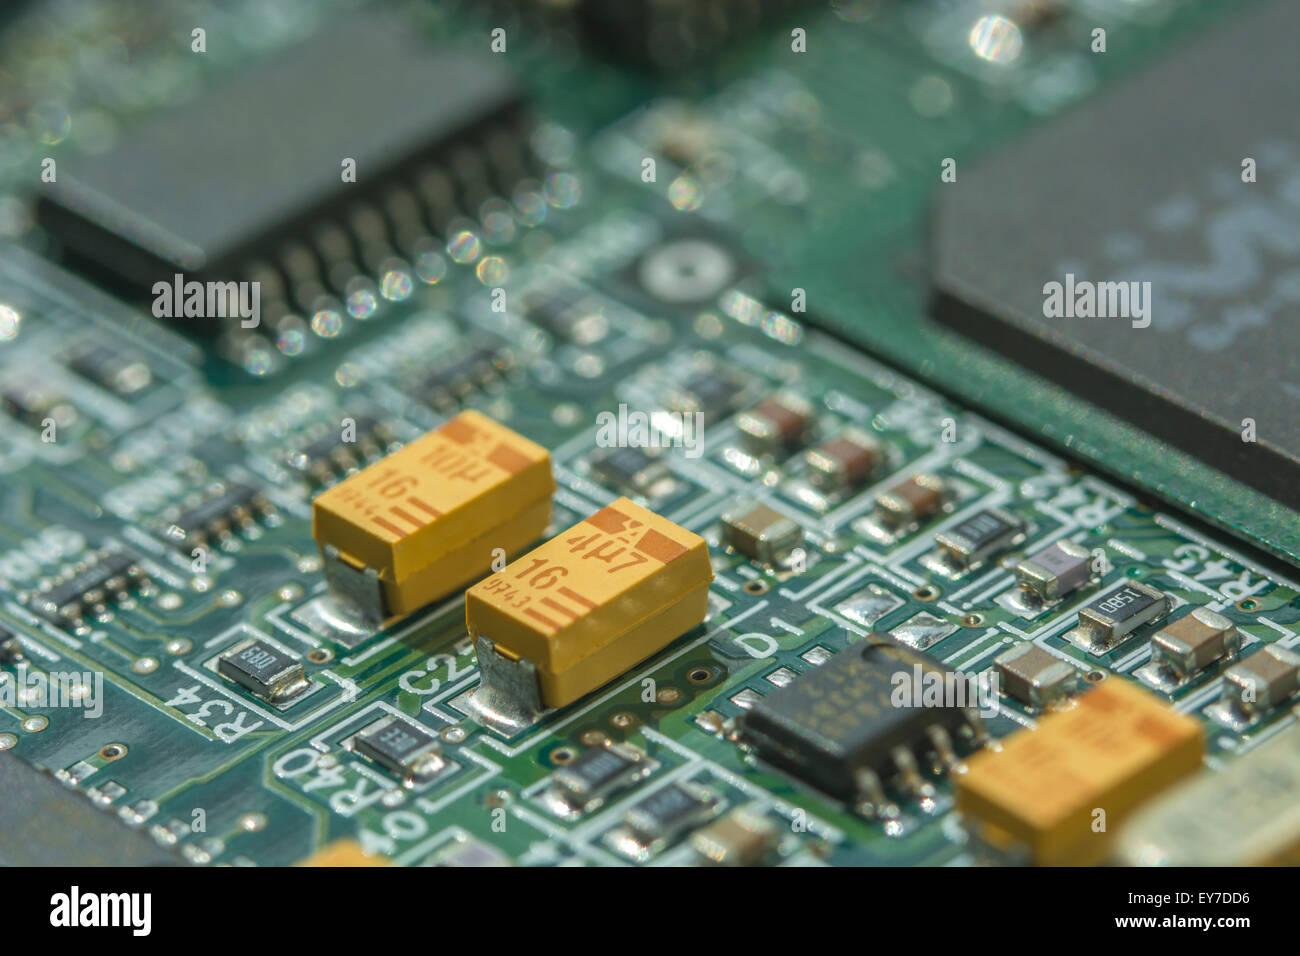 Macro Photo Of Printed Circuit Board Pcb Showing Yellow Tantalum Capacitors In Rare Element Oxide